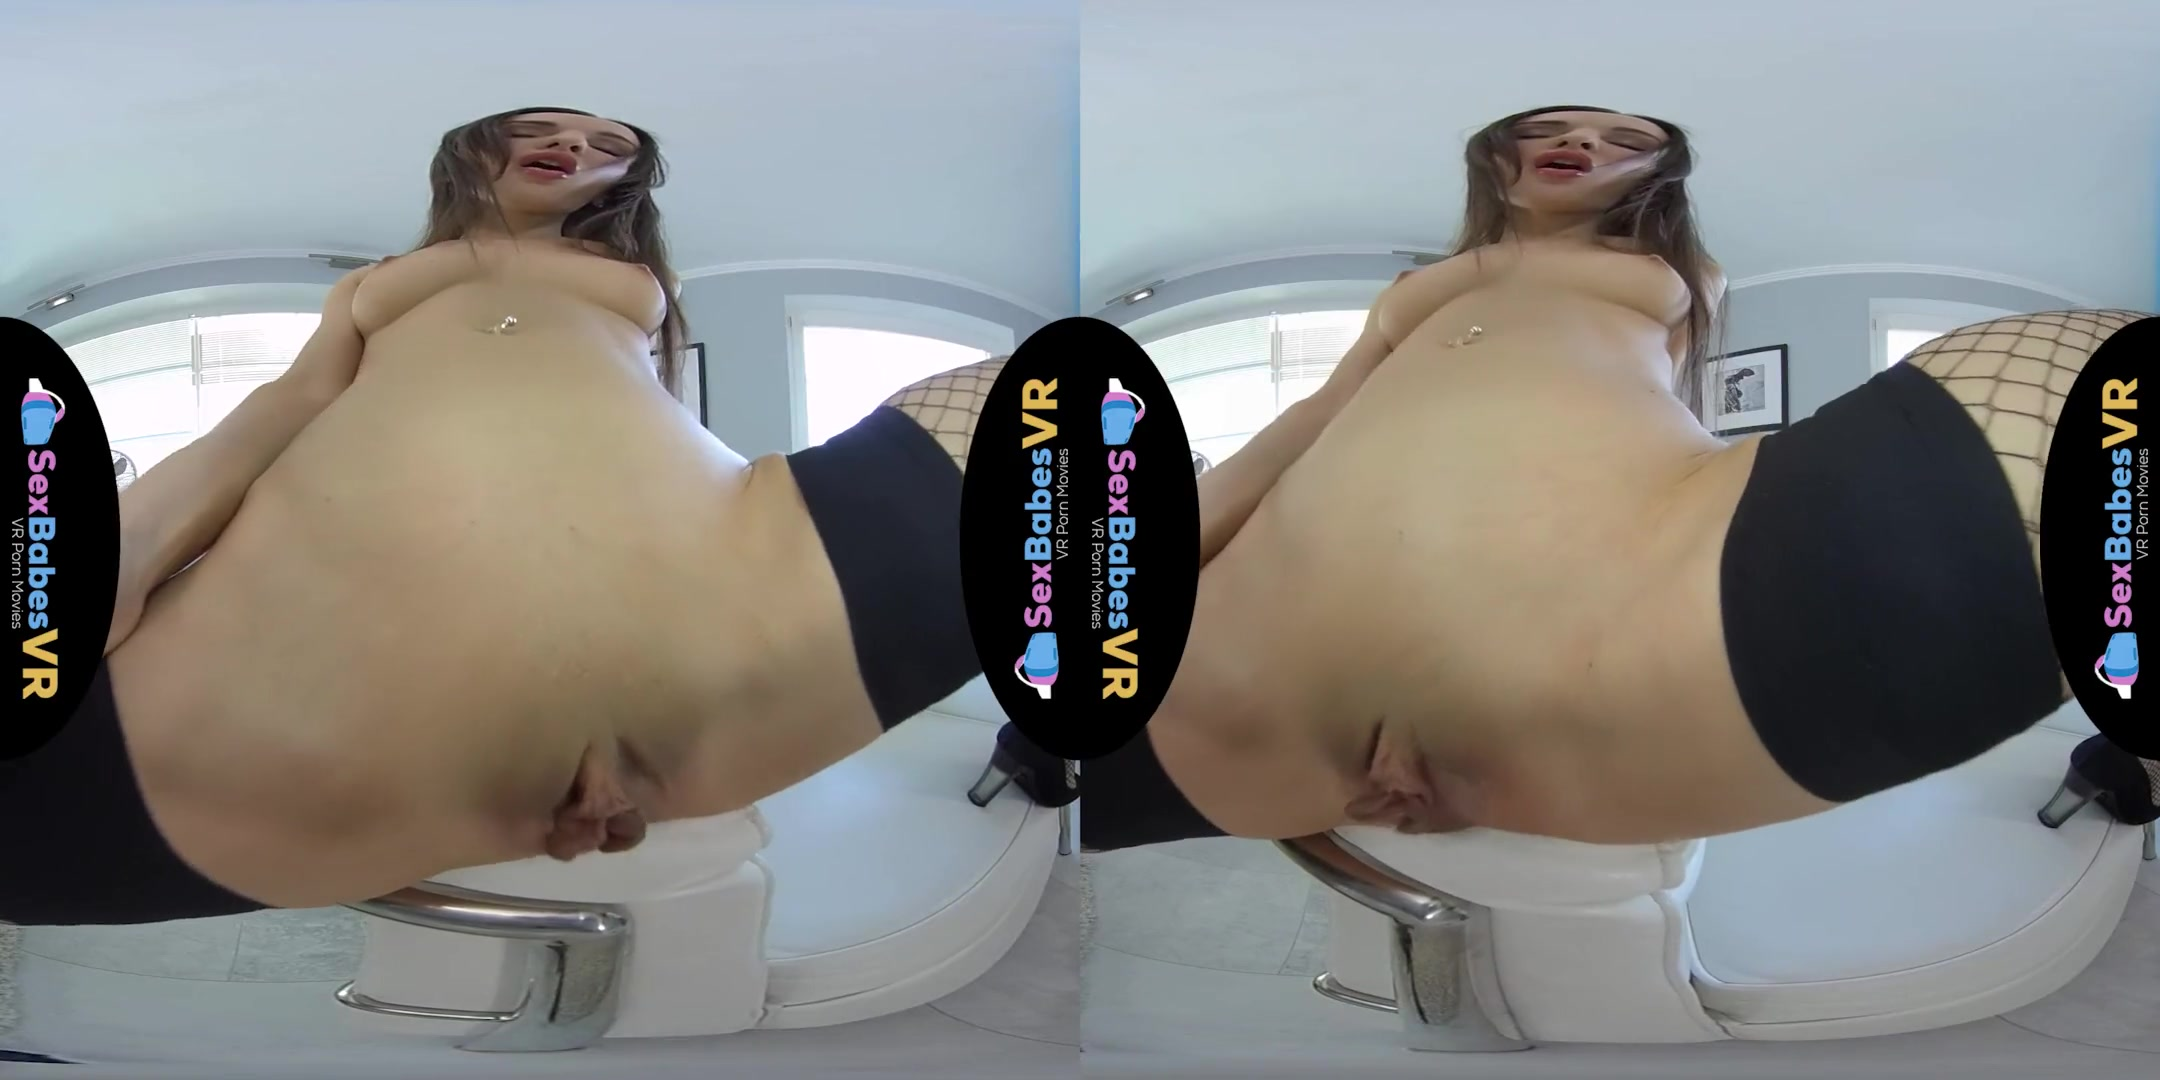 180 Porn sexbabesvr - 180 vr porno - virtual gf lilu moon